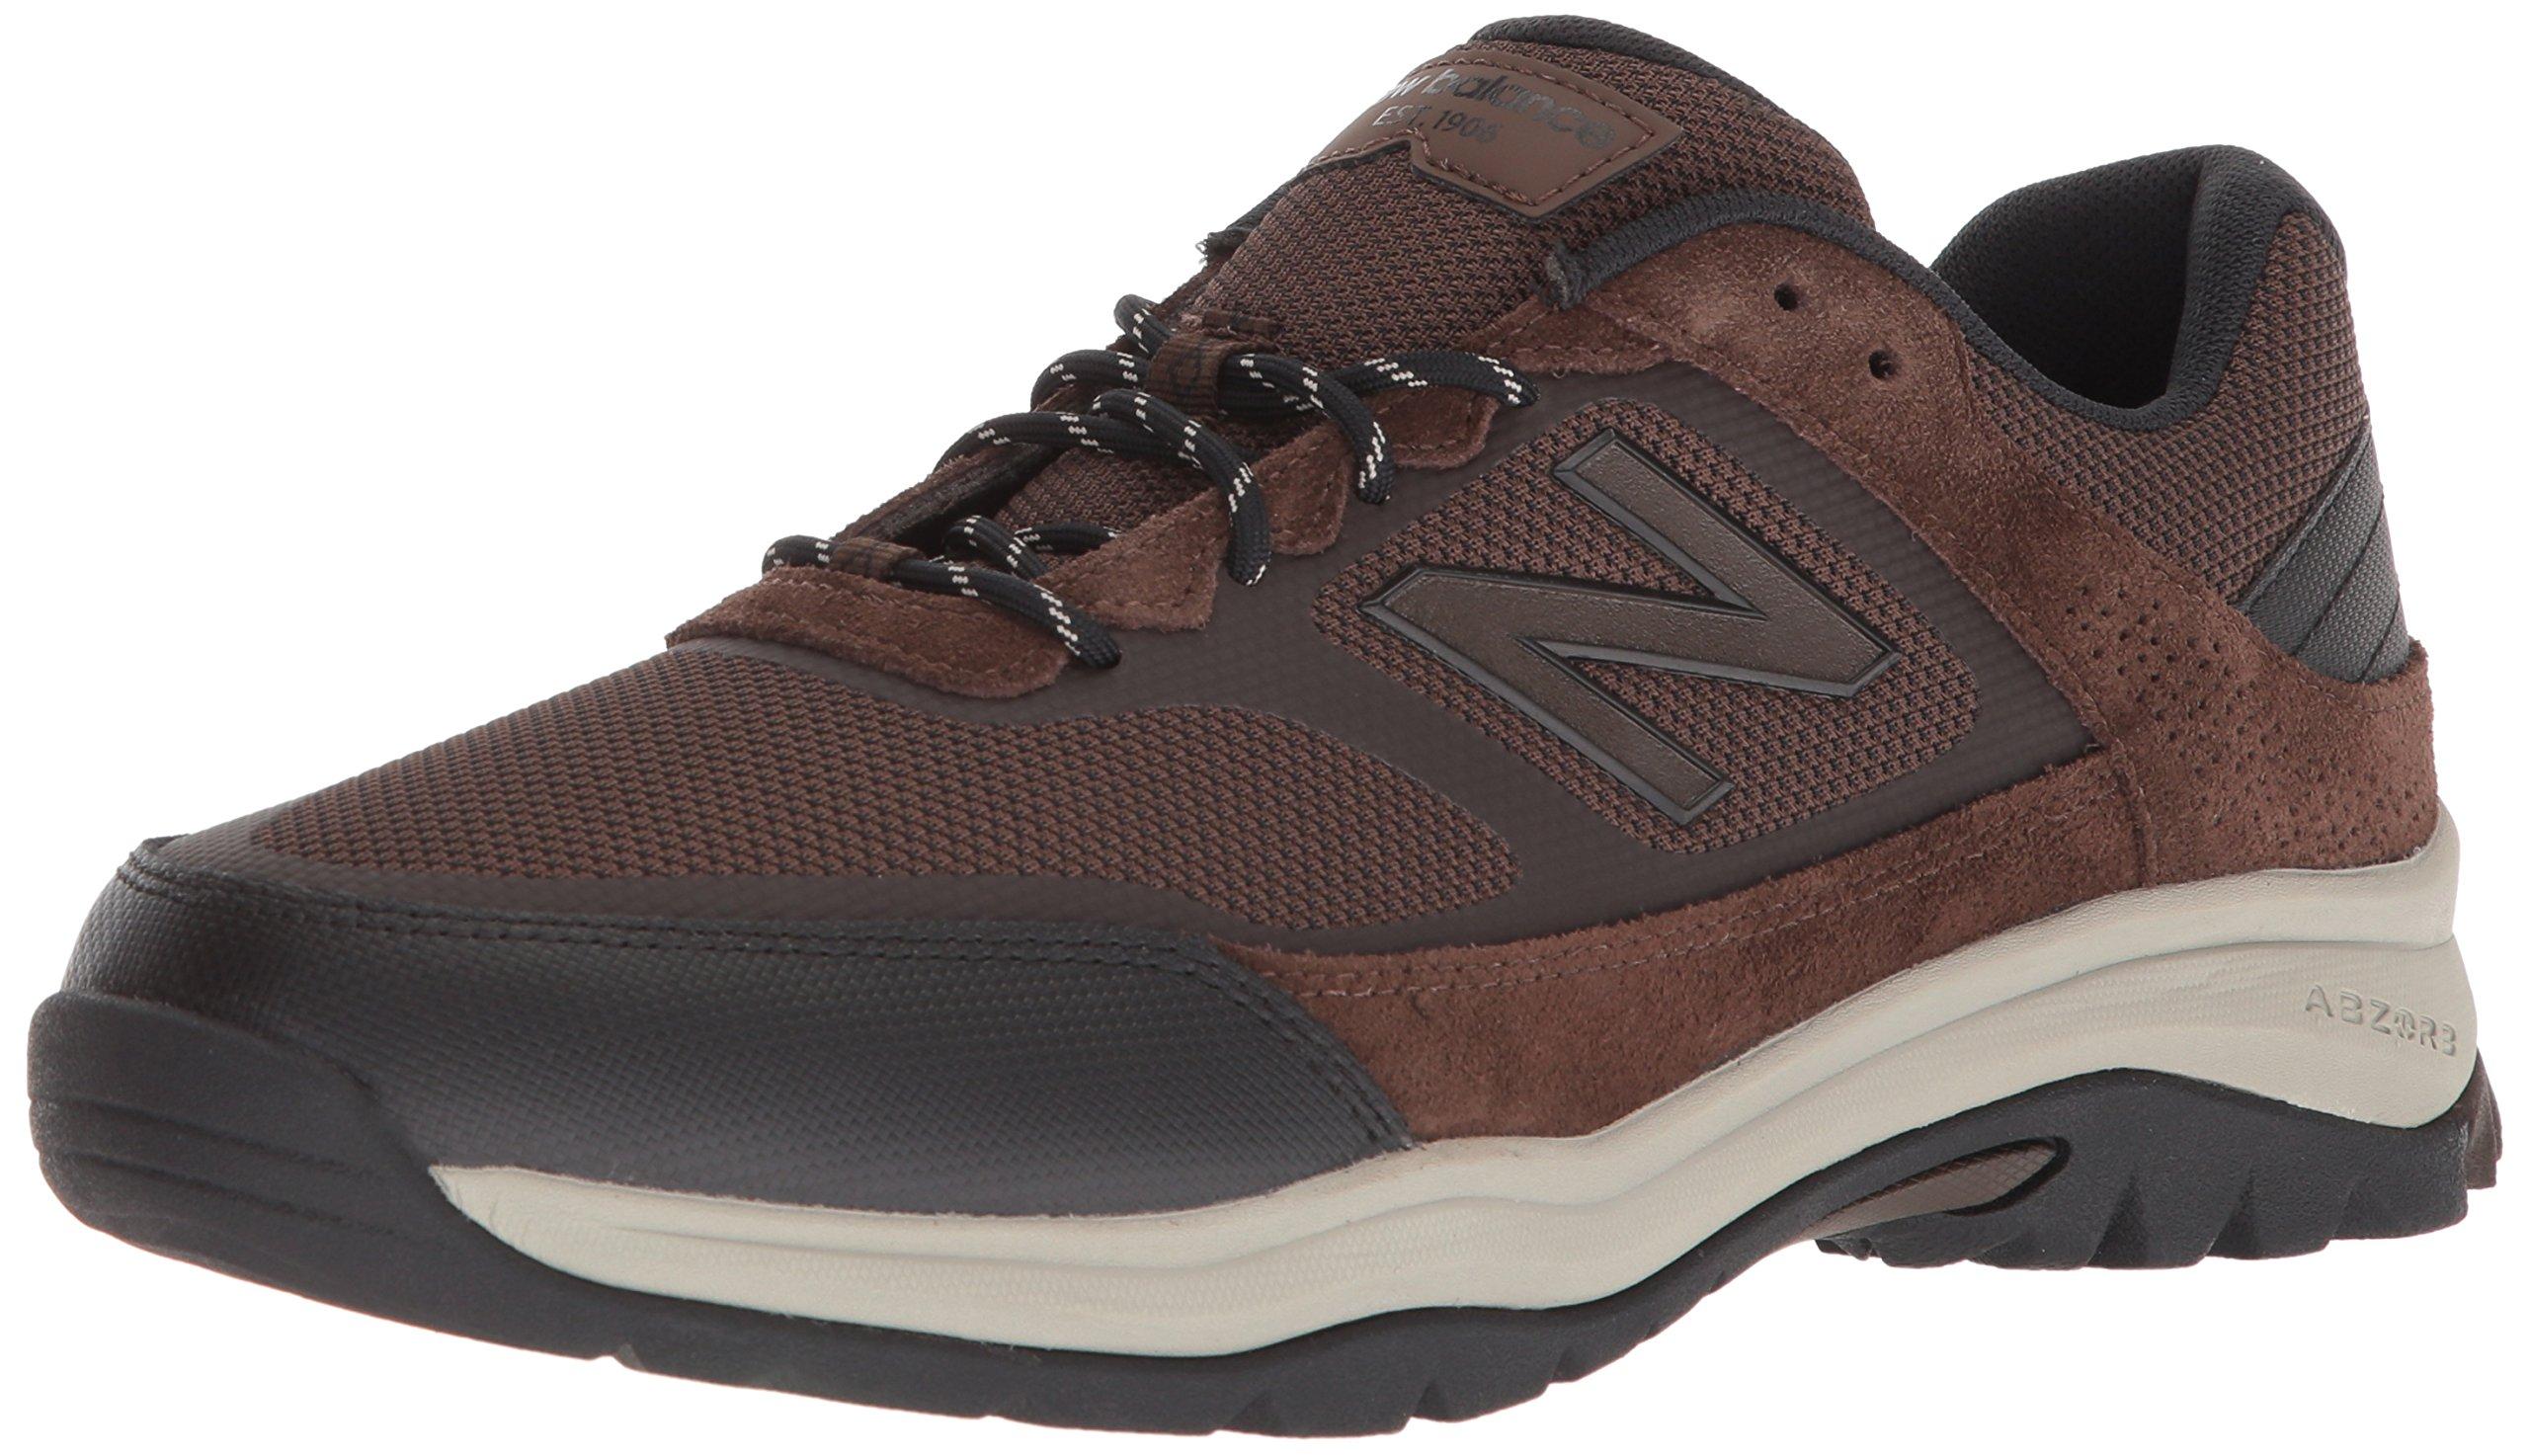 New Balance Men's MW669v1 Walking Shoe, Brown, 7.5 4E US by New Balance